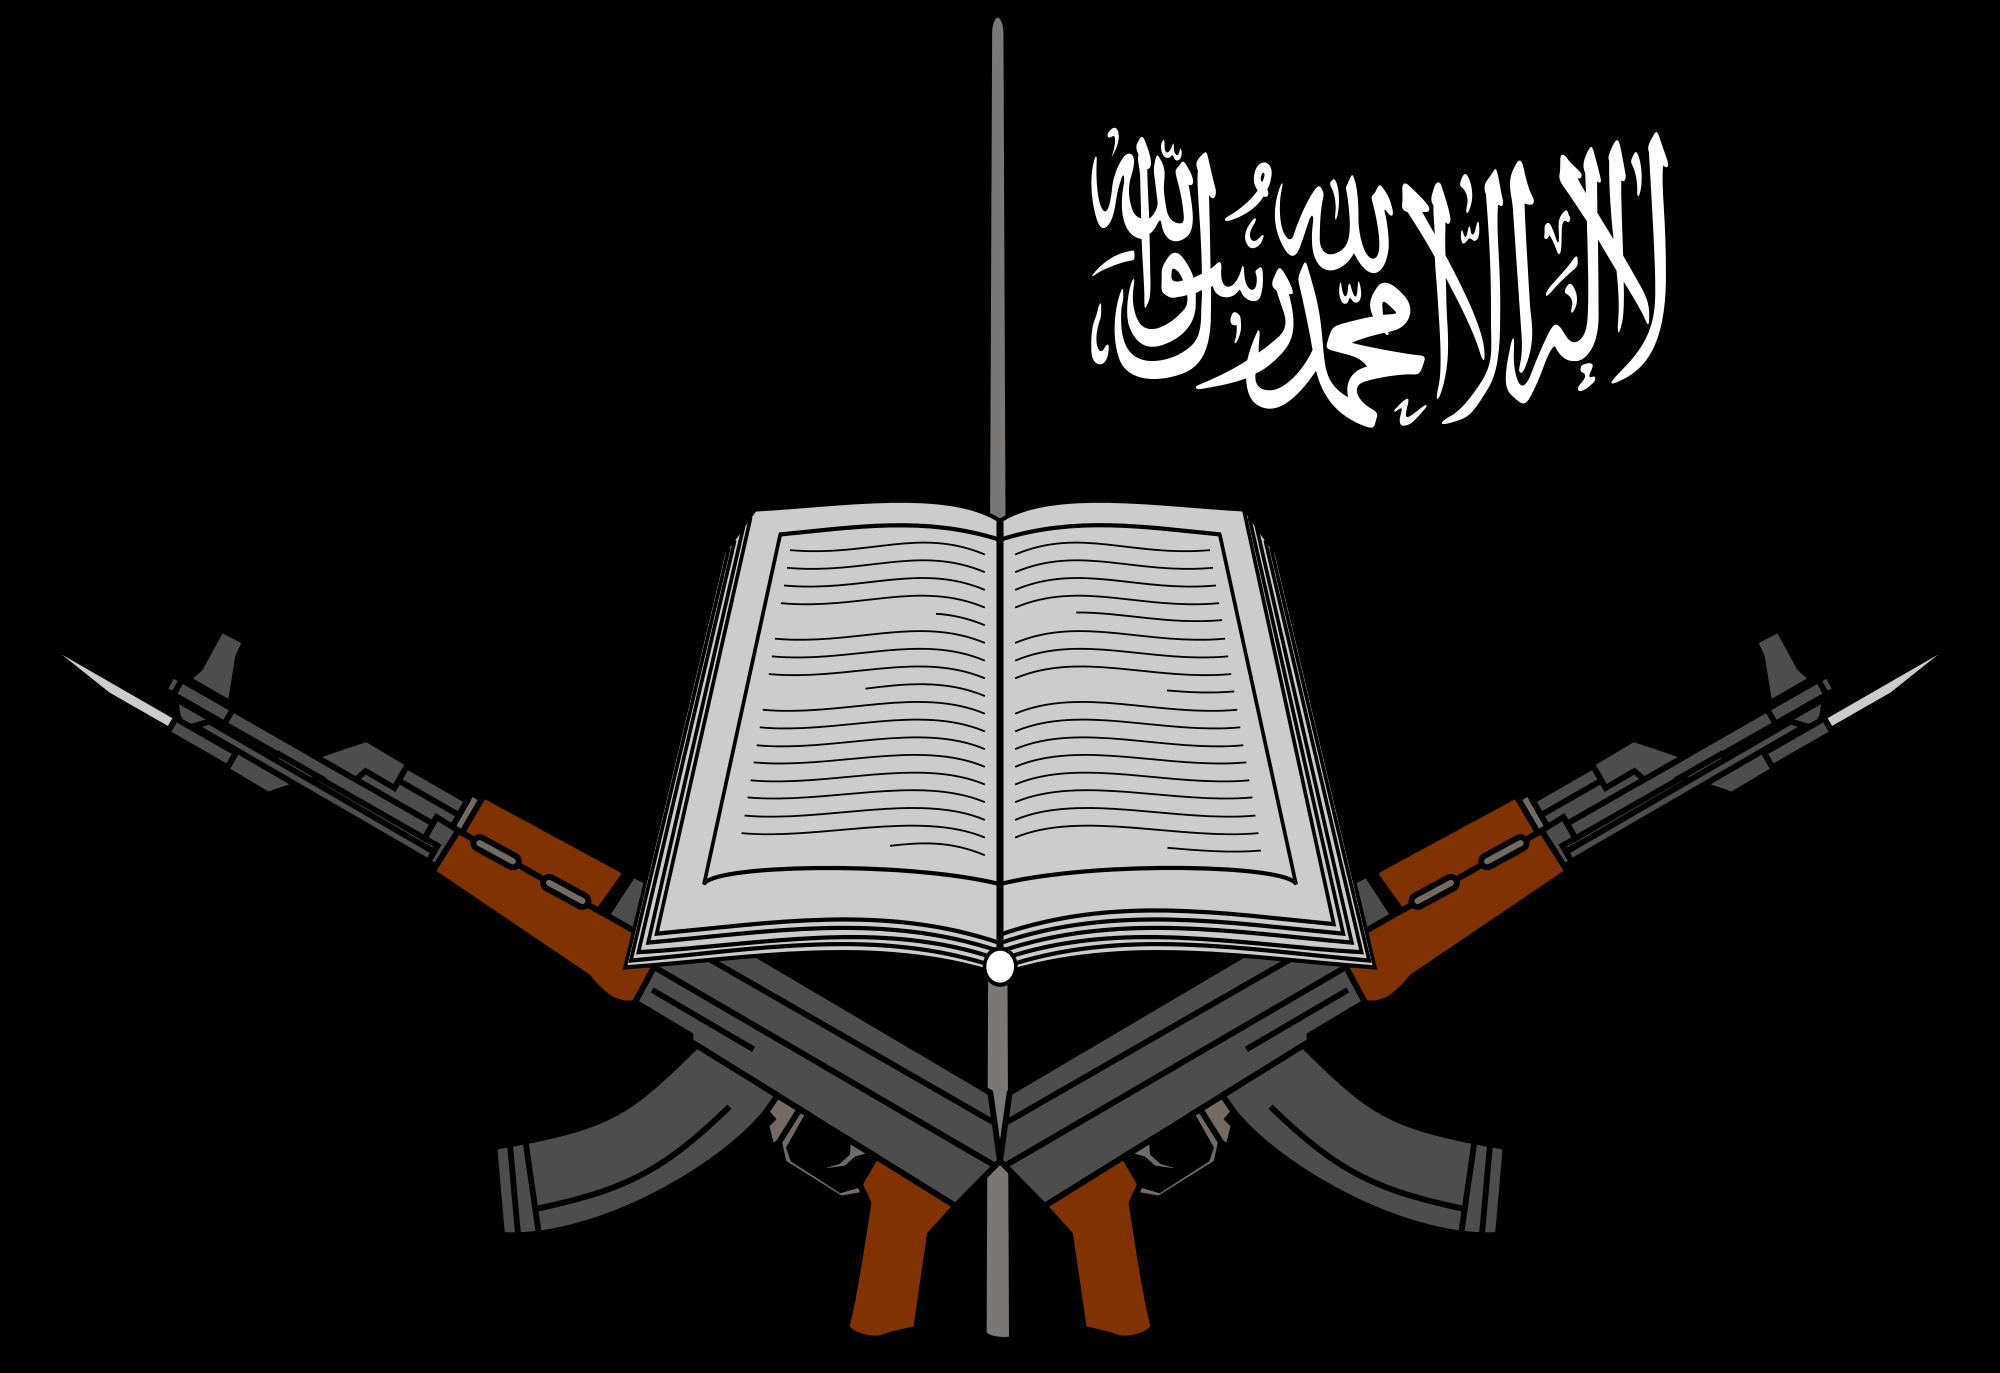 Crime clipart capture the flag. Islamic fundamentalism boko haram